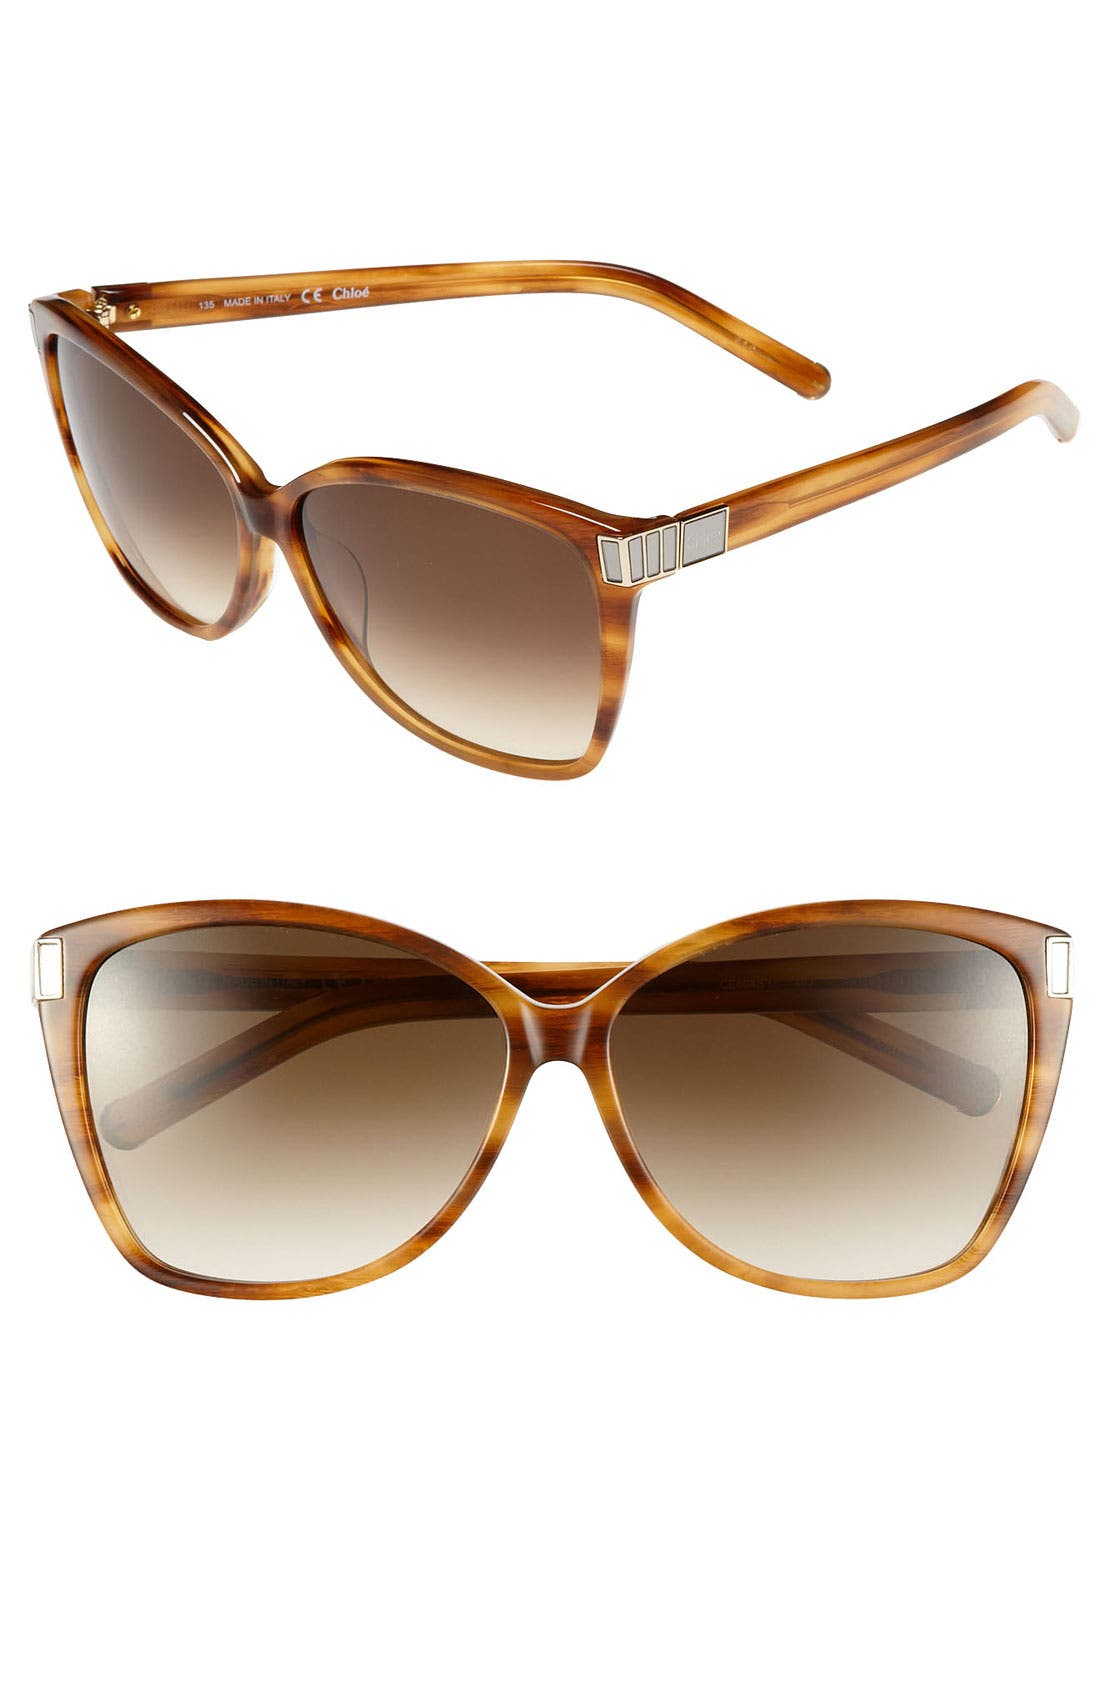 Alternate Image 1 Selected - Chloé 'Hoya' 59mm Sunglasses